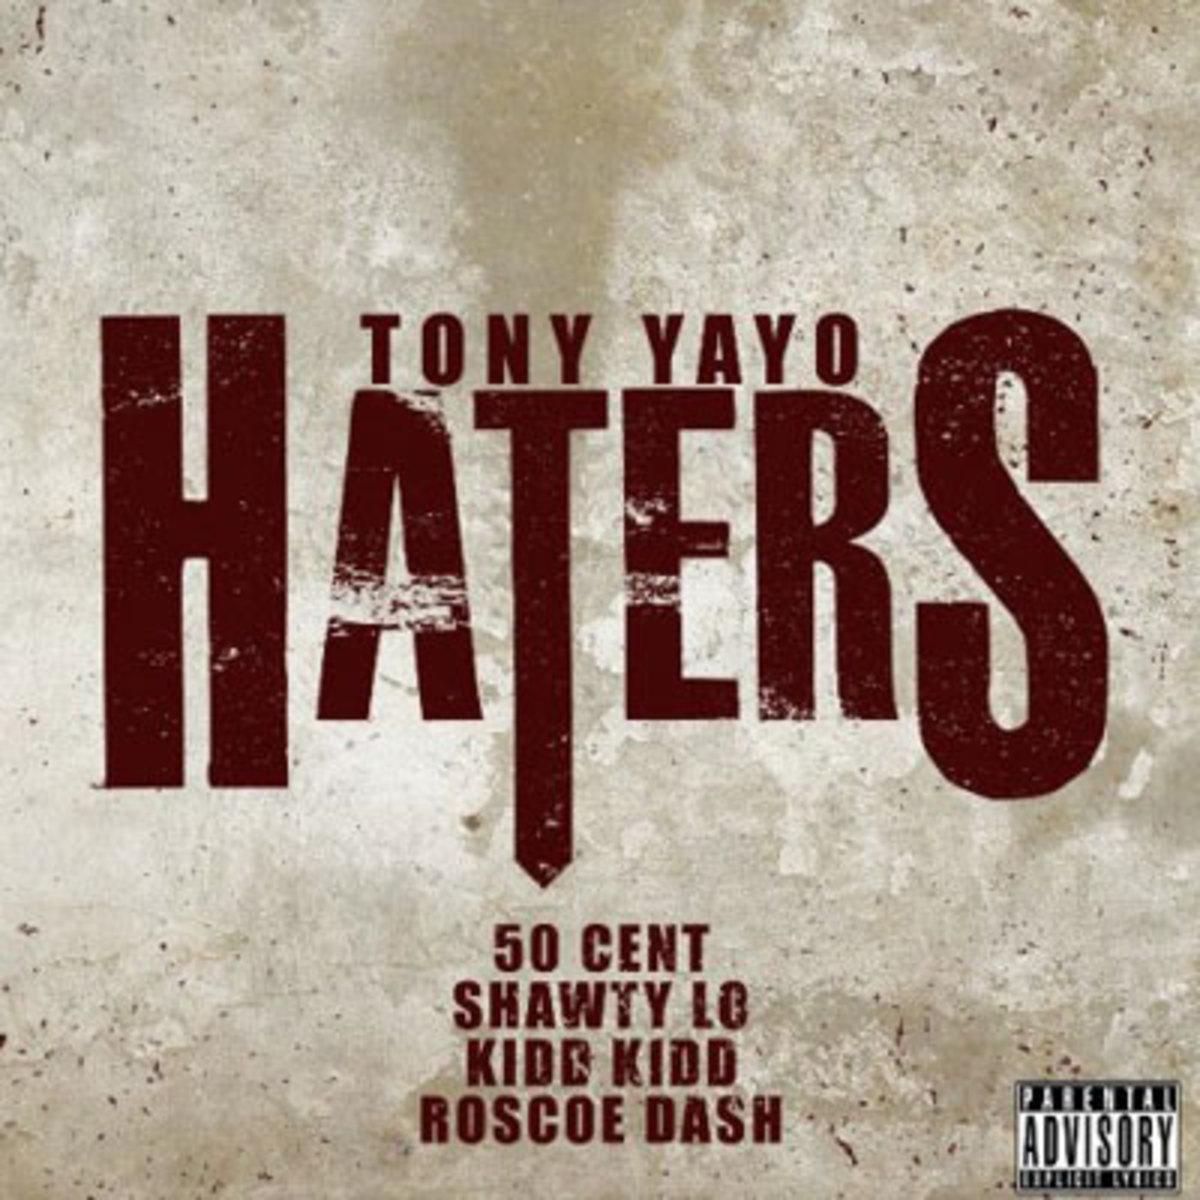 tonyyayo-haters.jpg